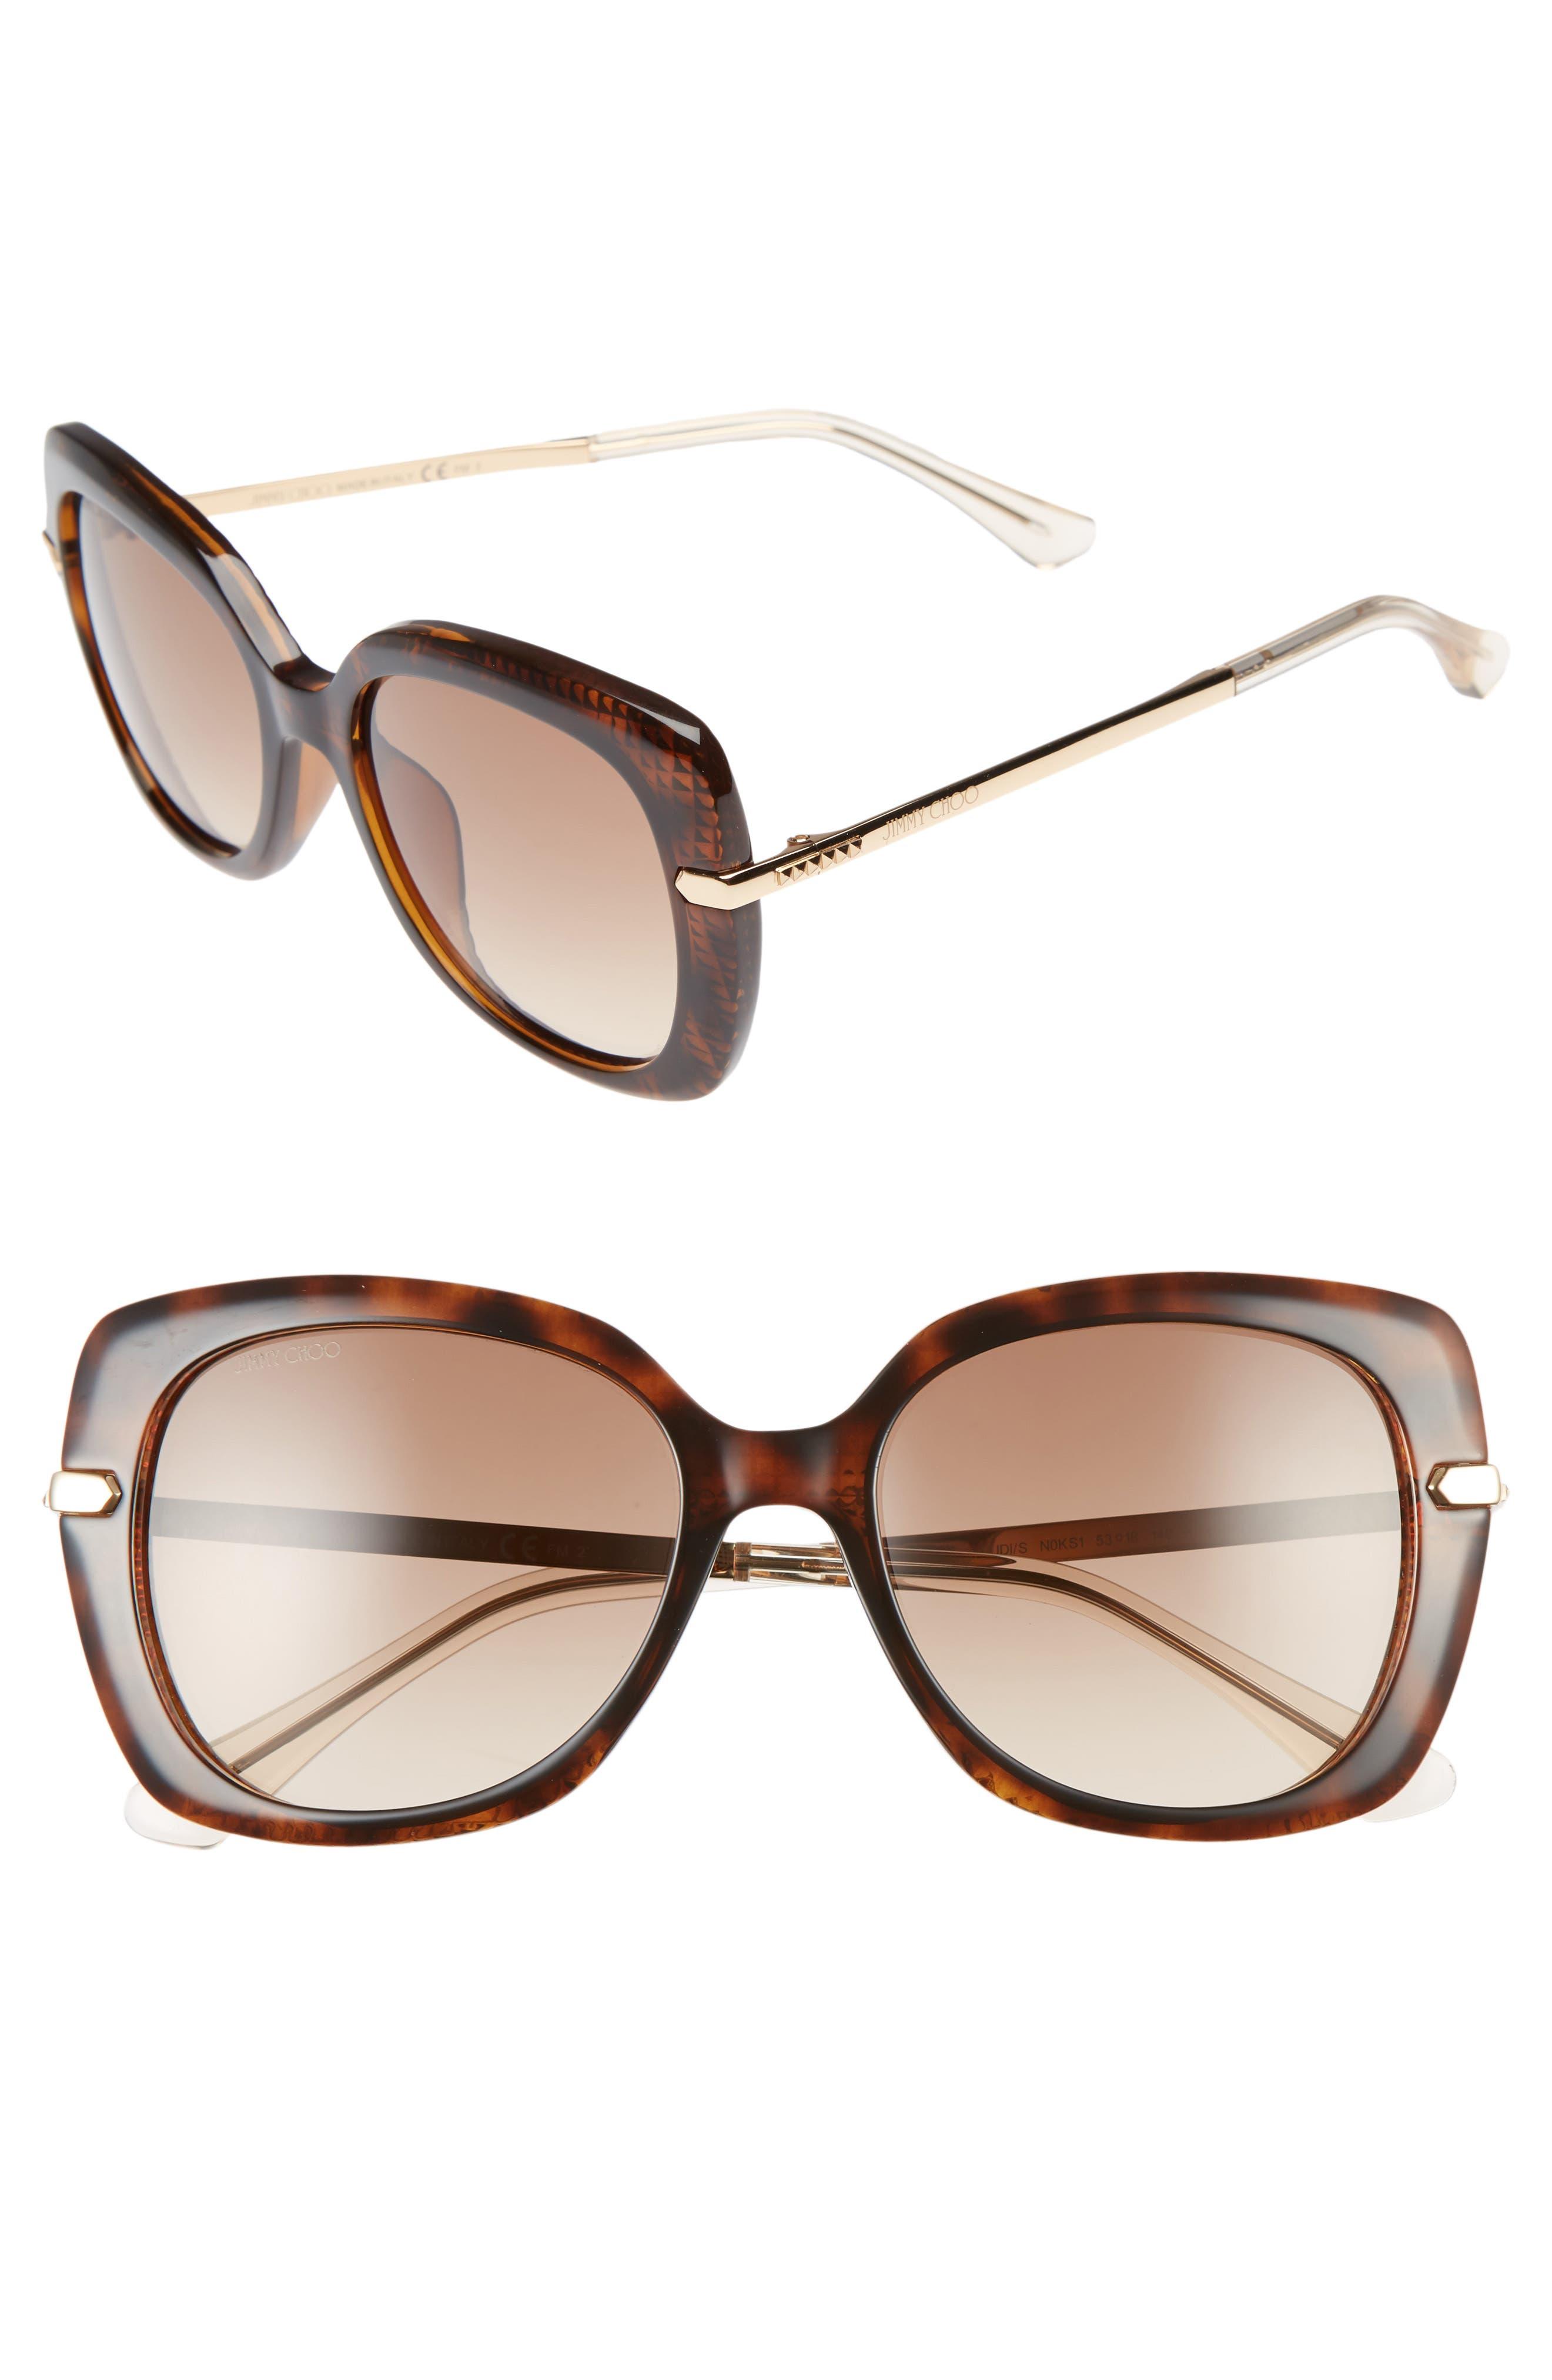 Main Image - Jimmy Choo Ludis 53mm Gradient Sunglasses